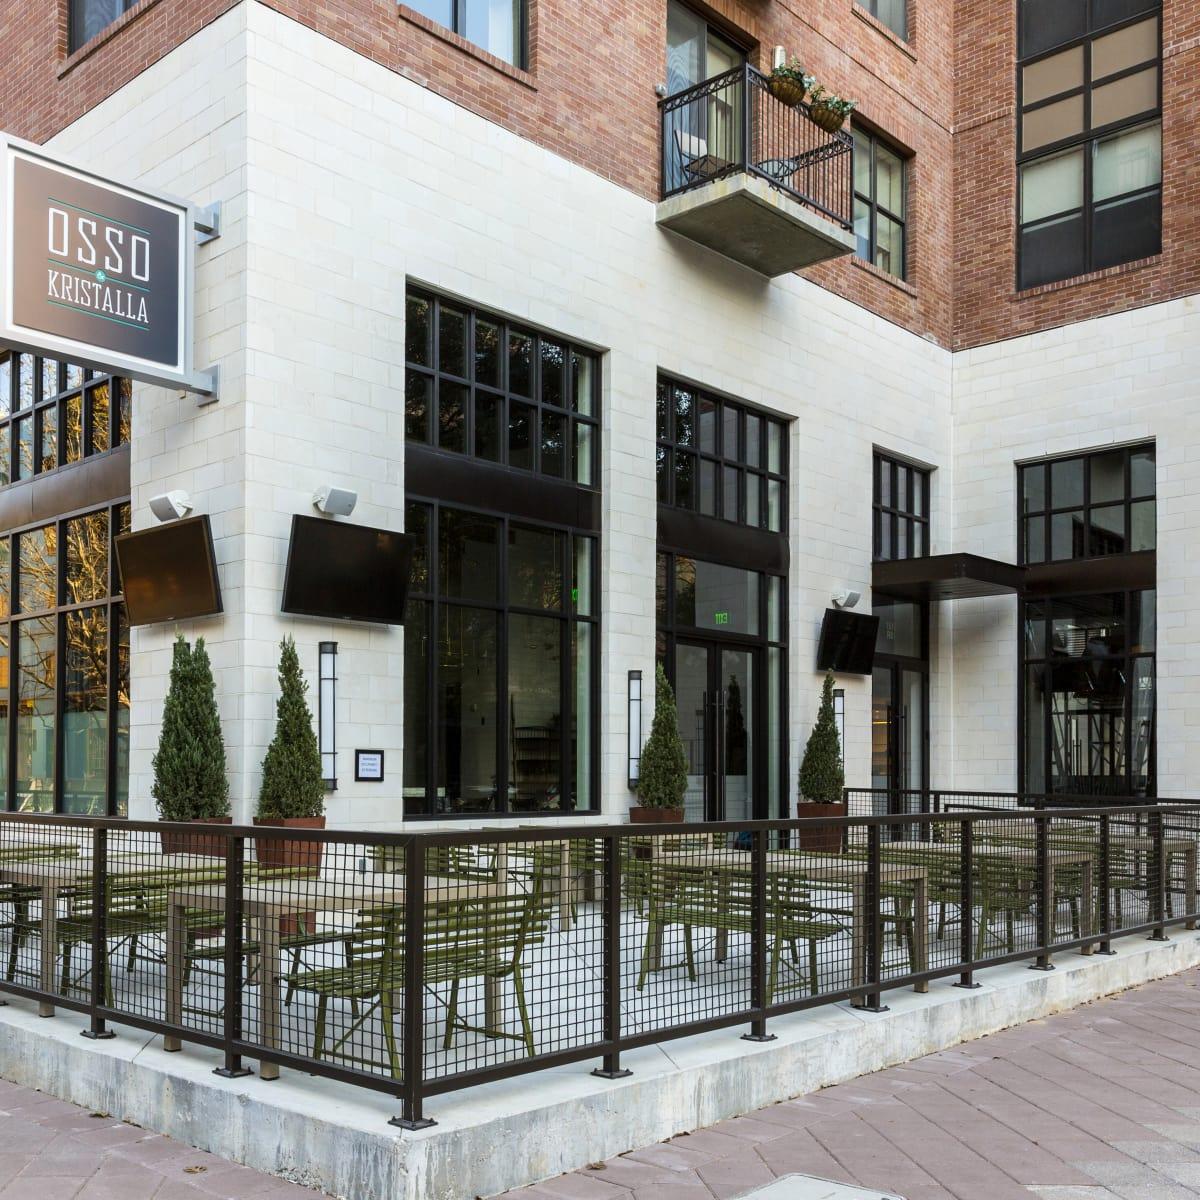 Houston, new patios, April 2017, Osso and Kristalla